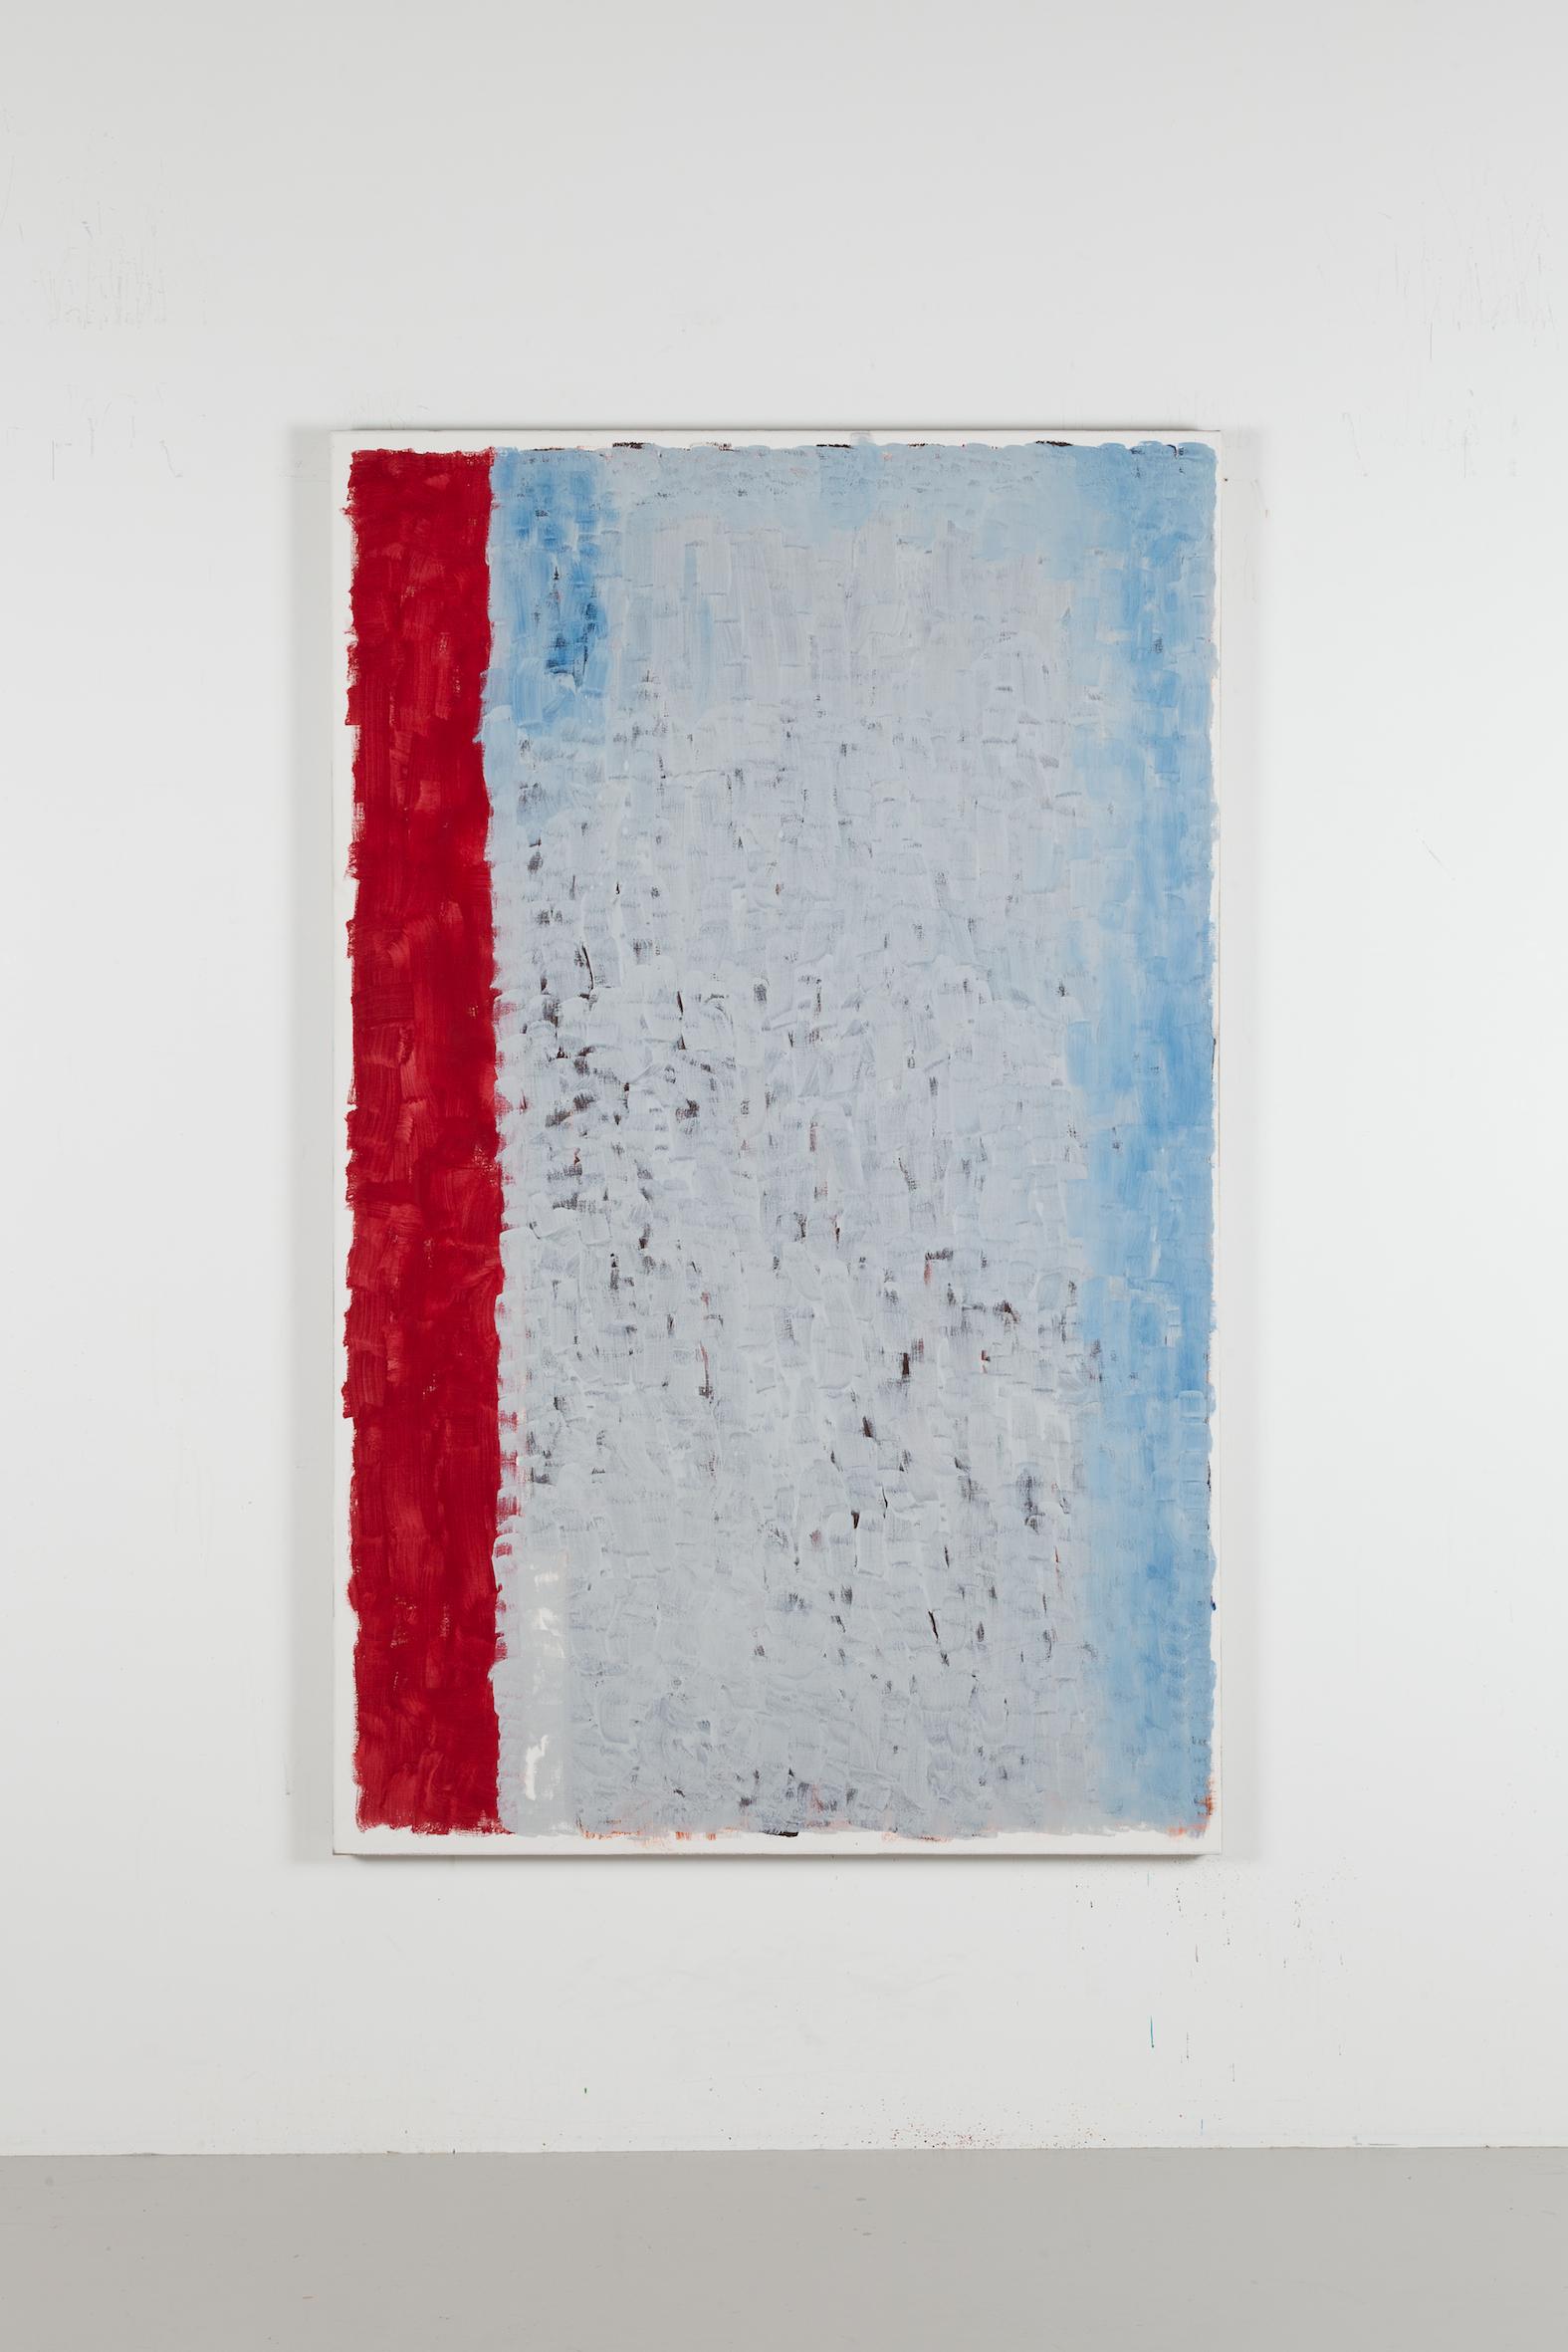 Westend #11, 2017, Egg tempera on canvas, 160 x 100 cm